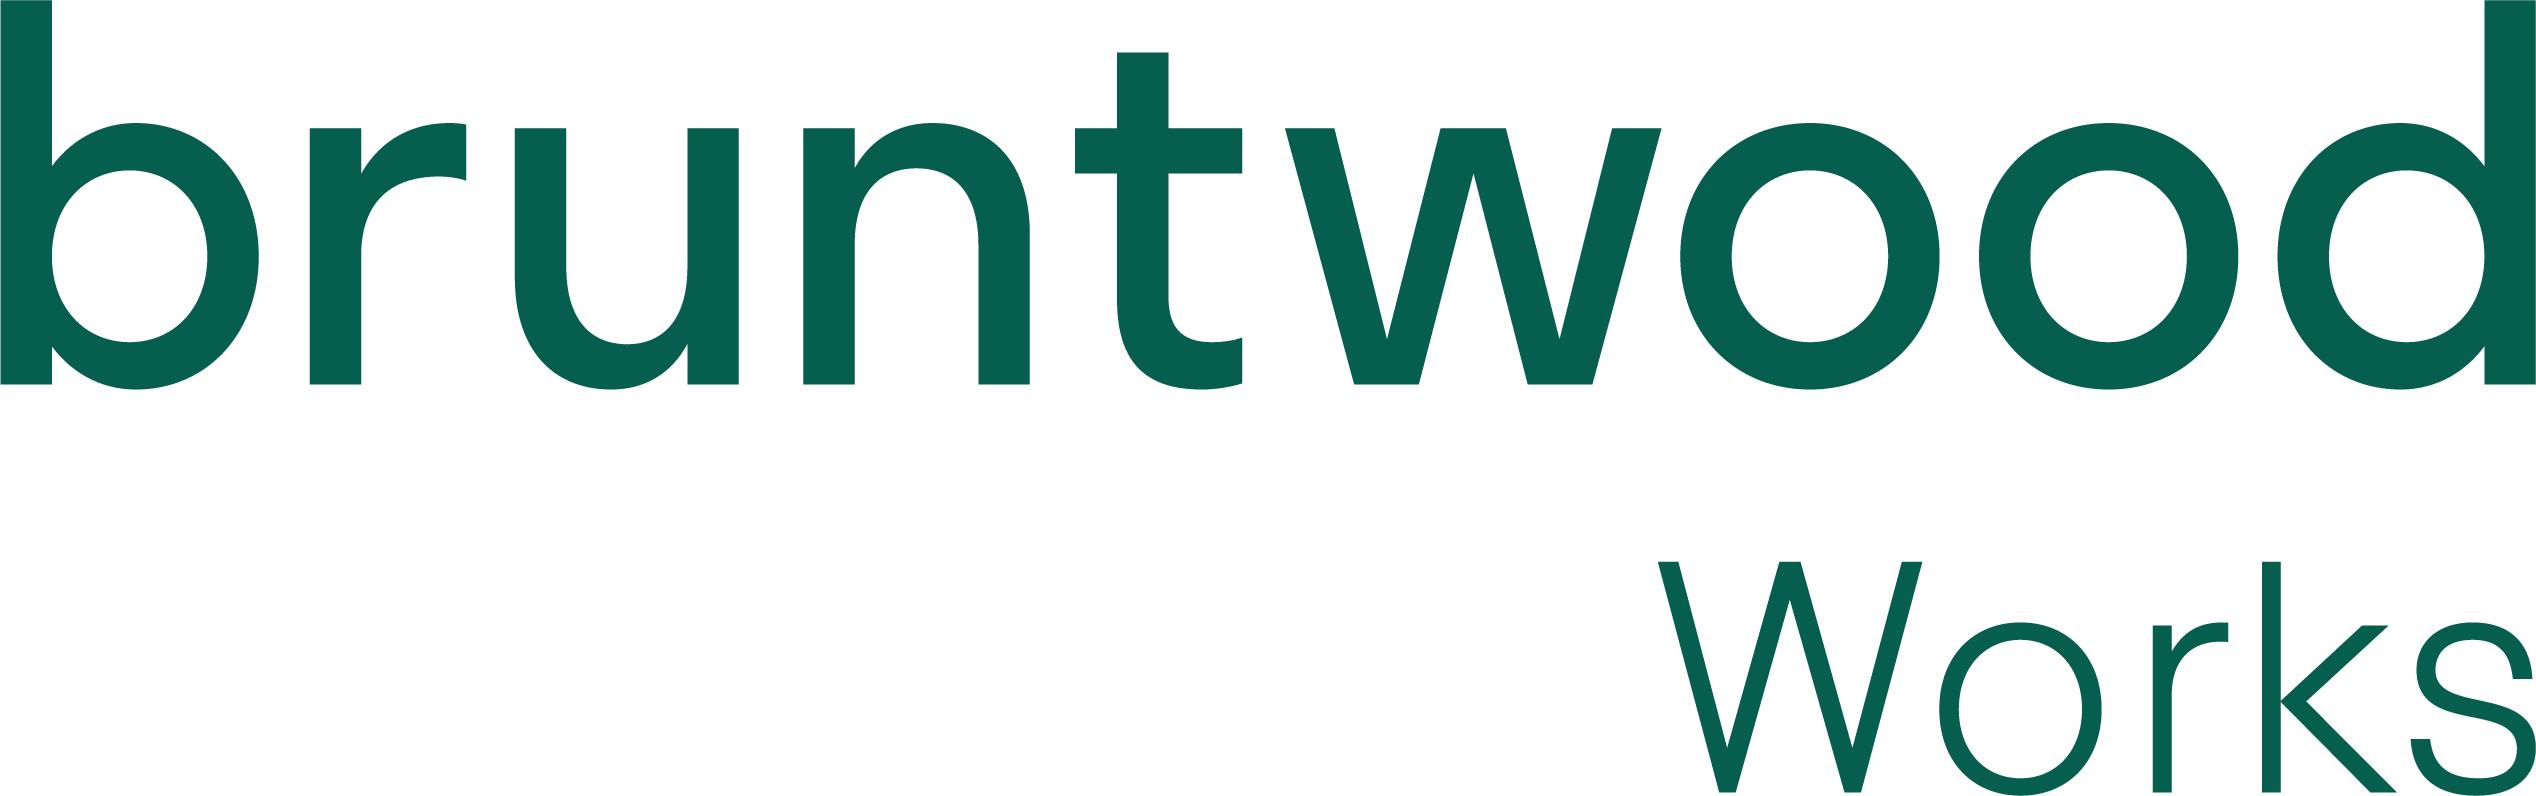 Bruntwood-Works